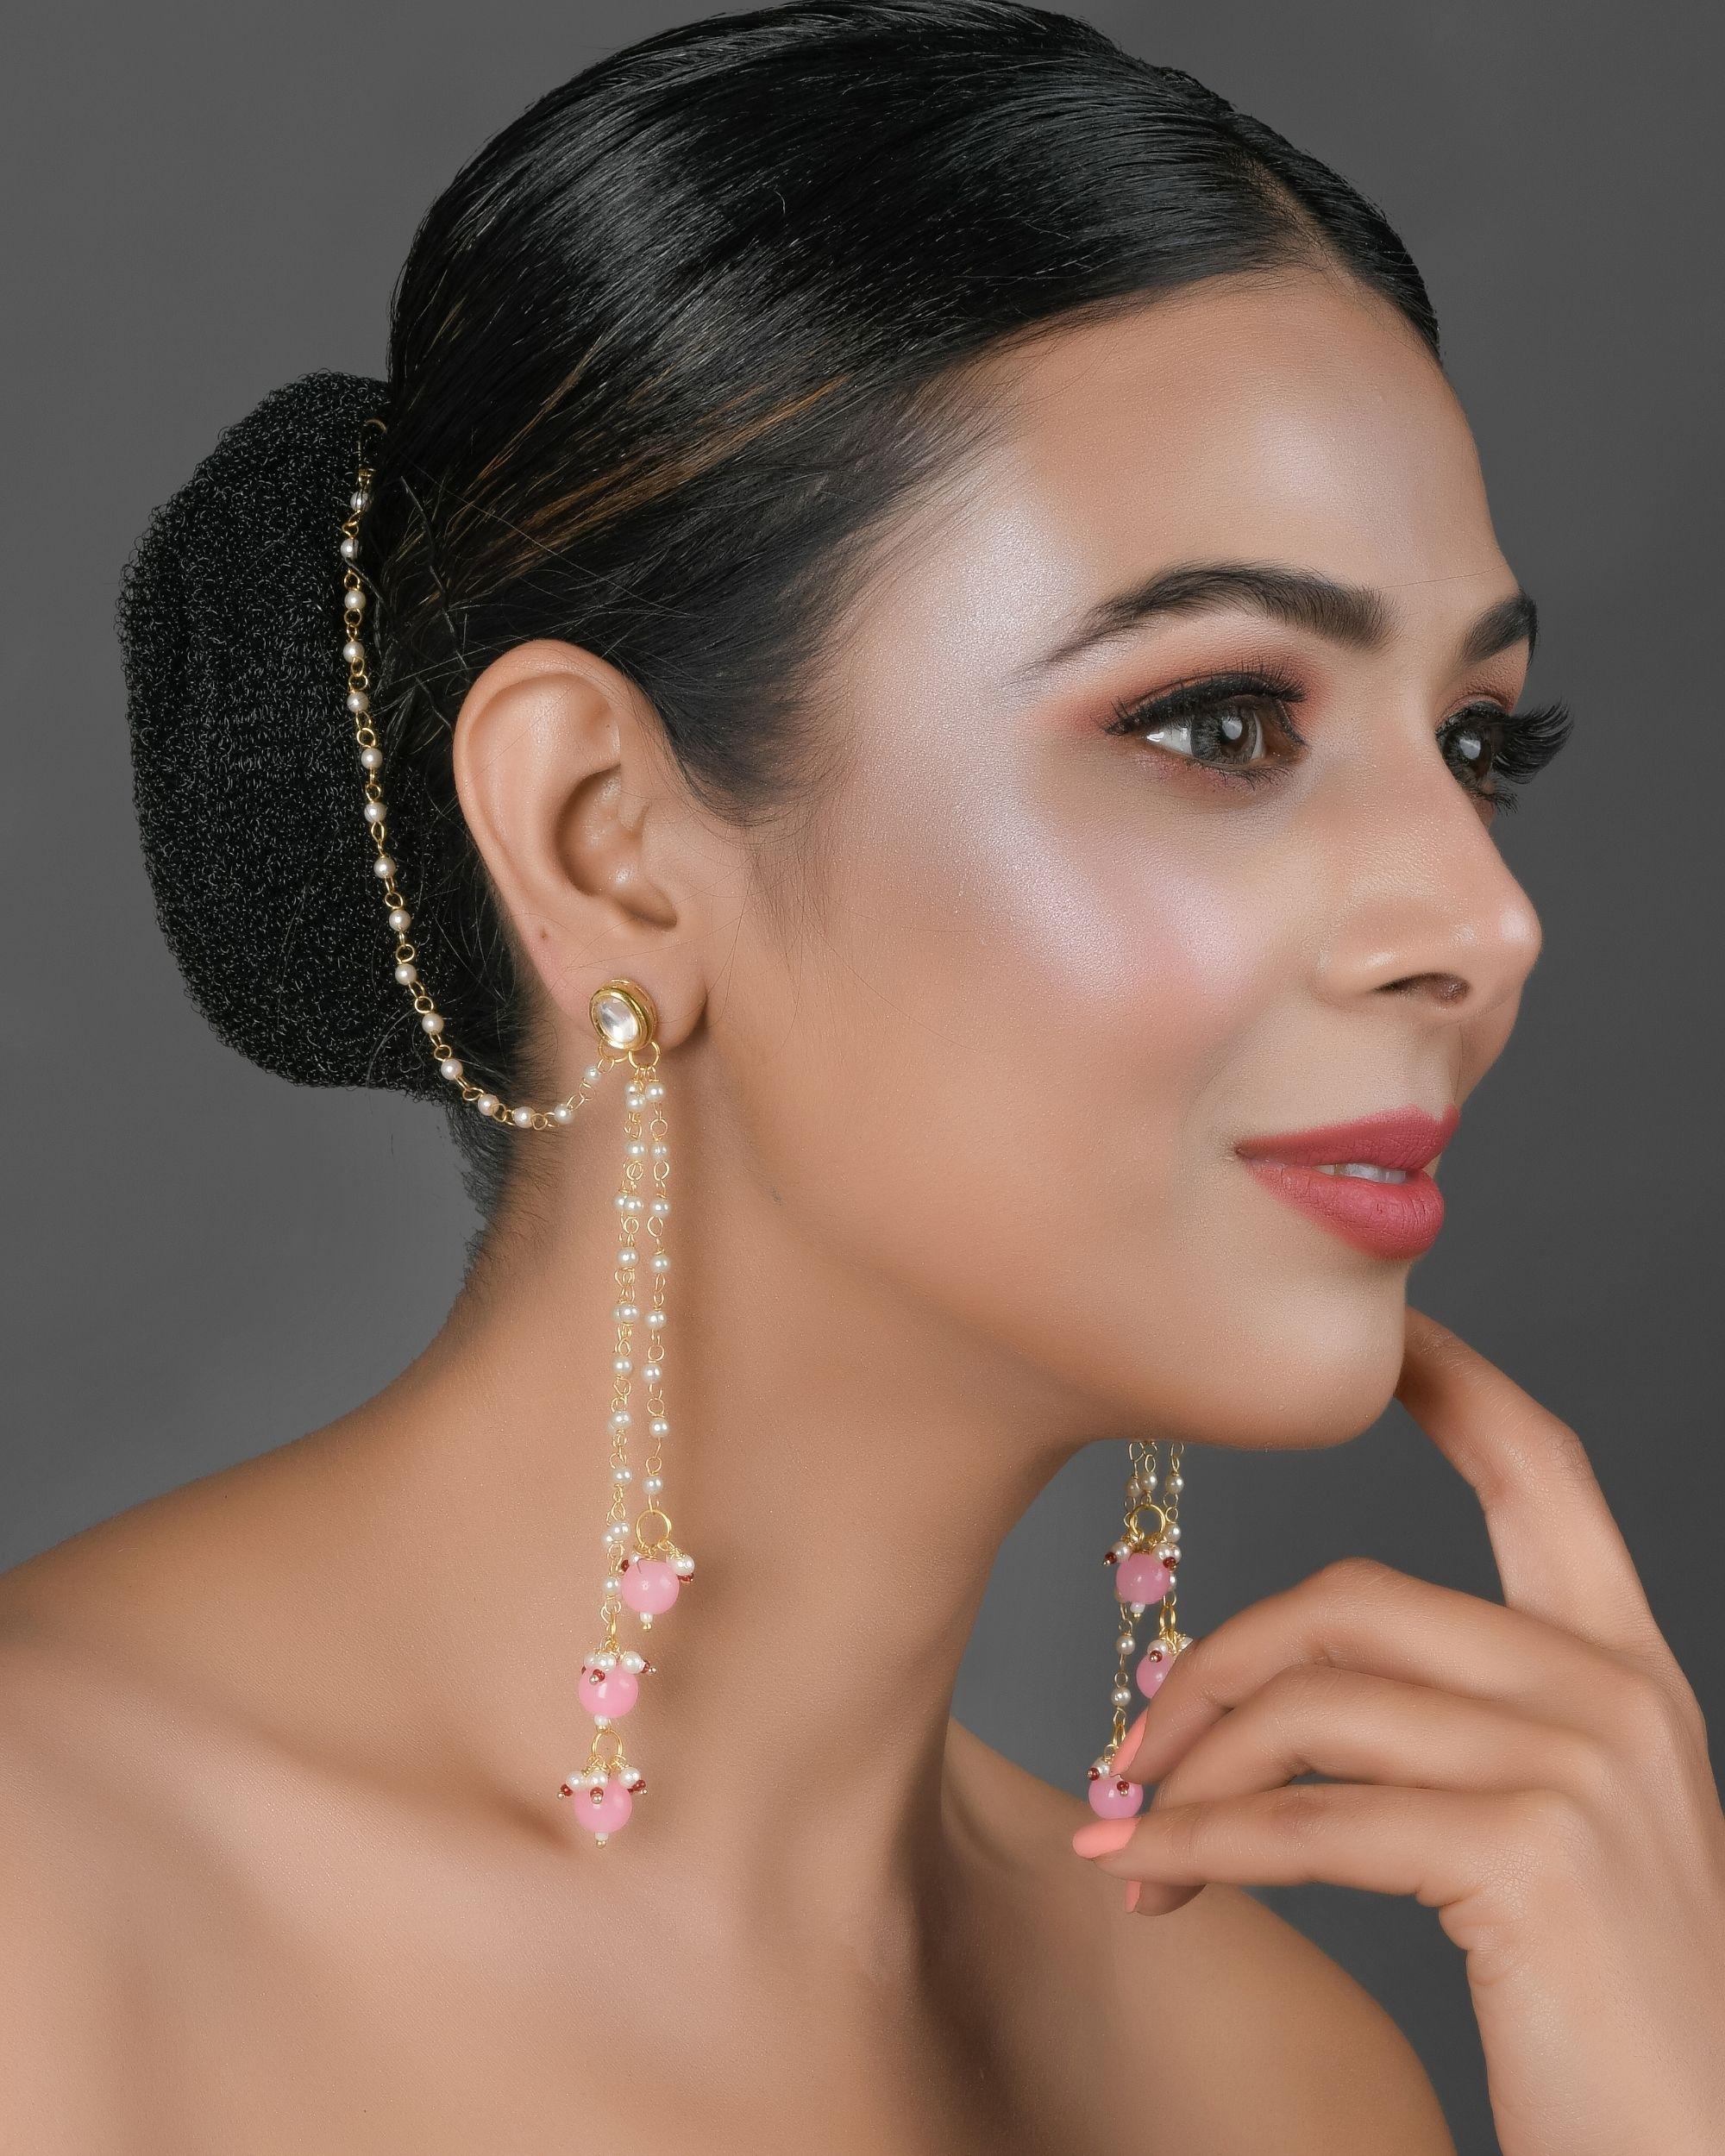 Kundan stone and pink beaded tassel earrings with hair chain